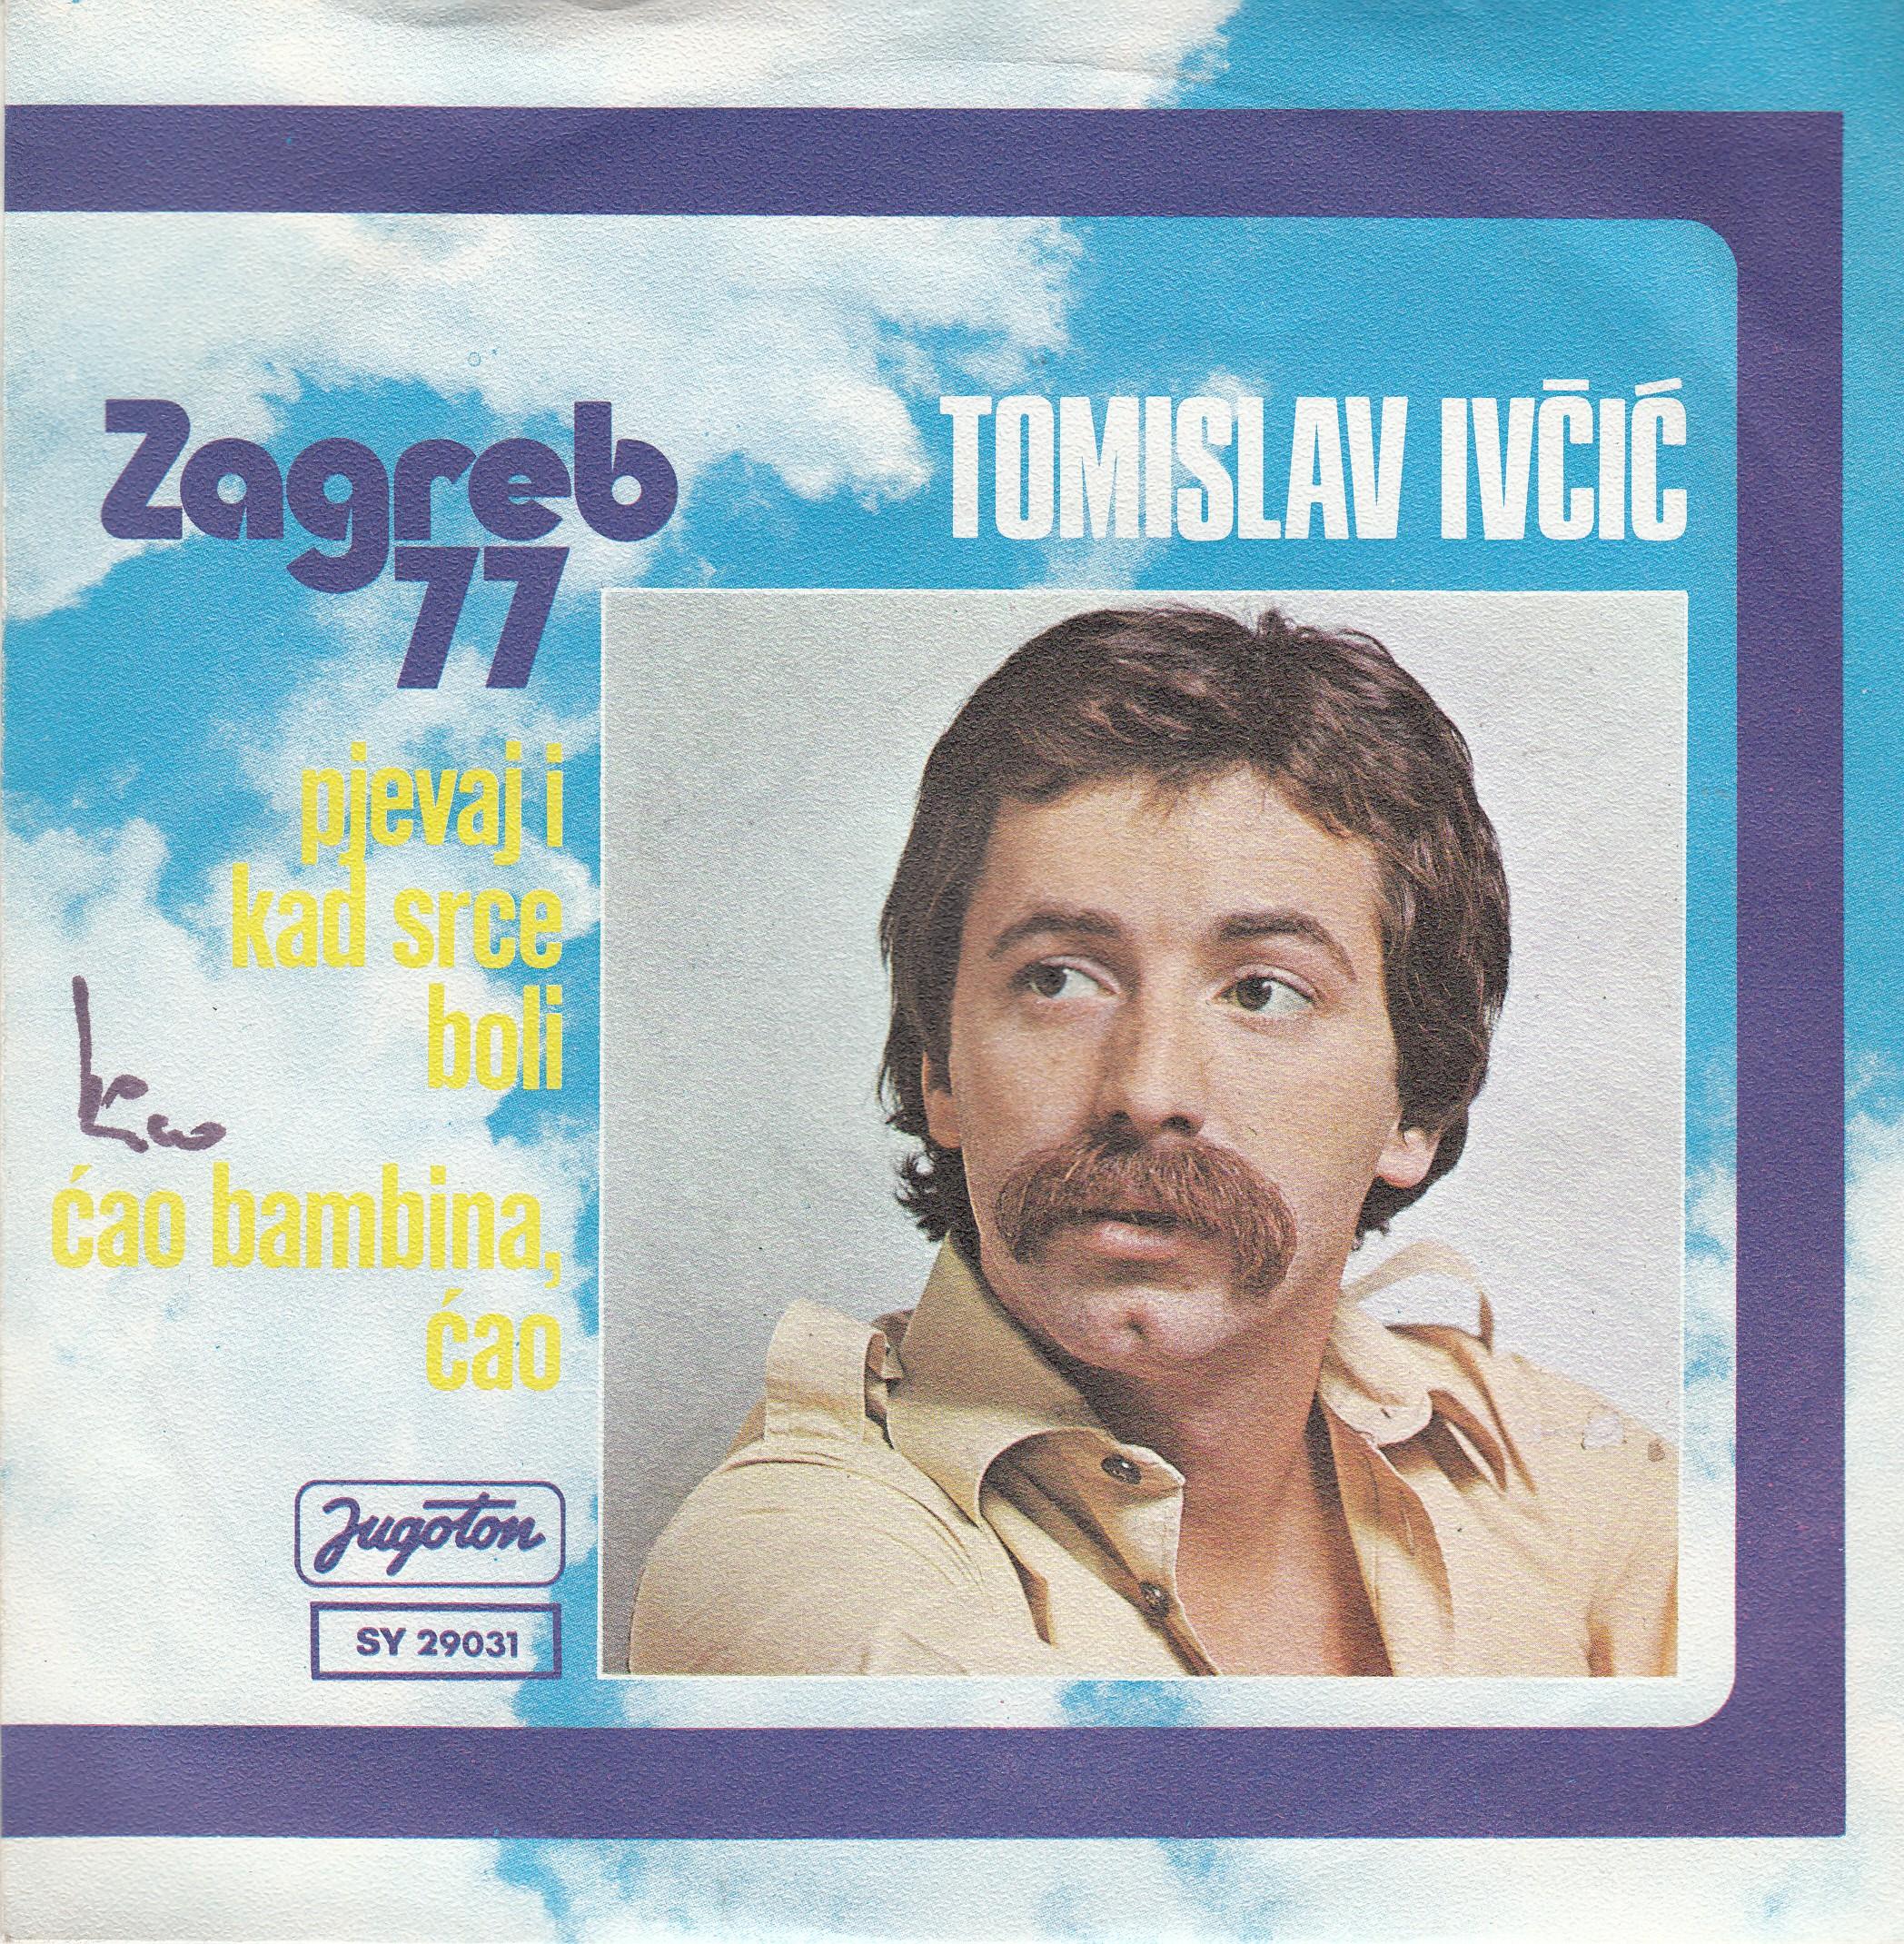 Ivcic Tomislav - Pjevaj I Kad Srce Boli/cao Bambina Cao